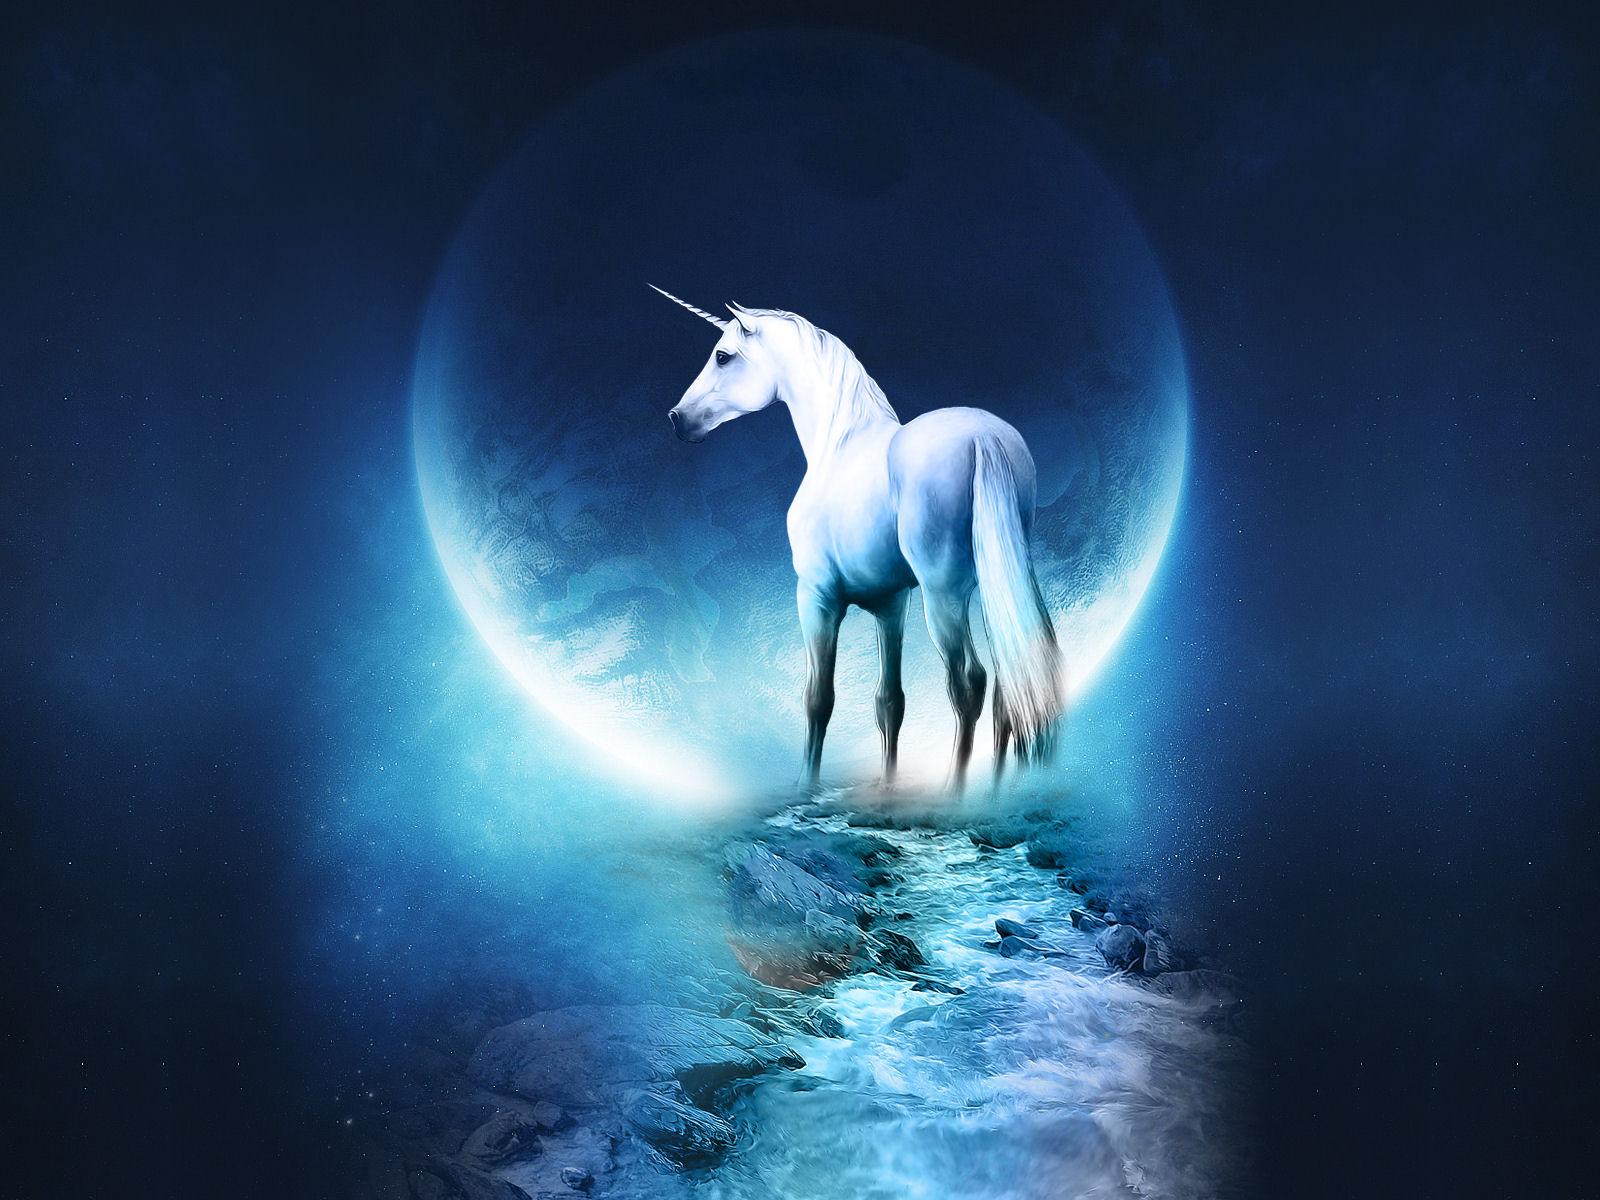 http://4.bp.blogspot.com/_QhdMMnsB2ww/TJ2smNDN7HI/AAAAAAAAAAg/N2vNrcuzmYE/s1600/Fantasy%2520space-03%5B1%5D.jpg